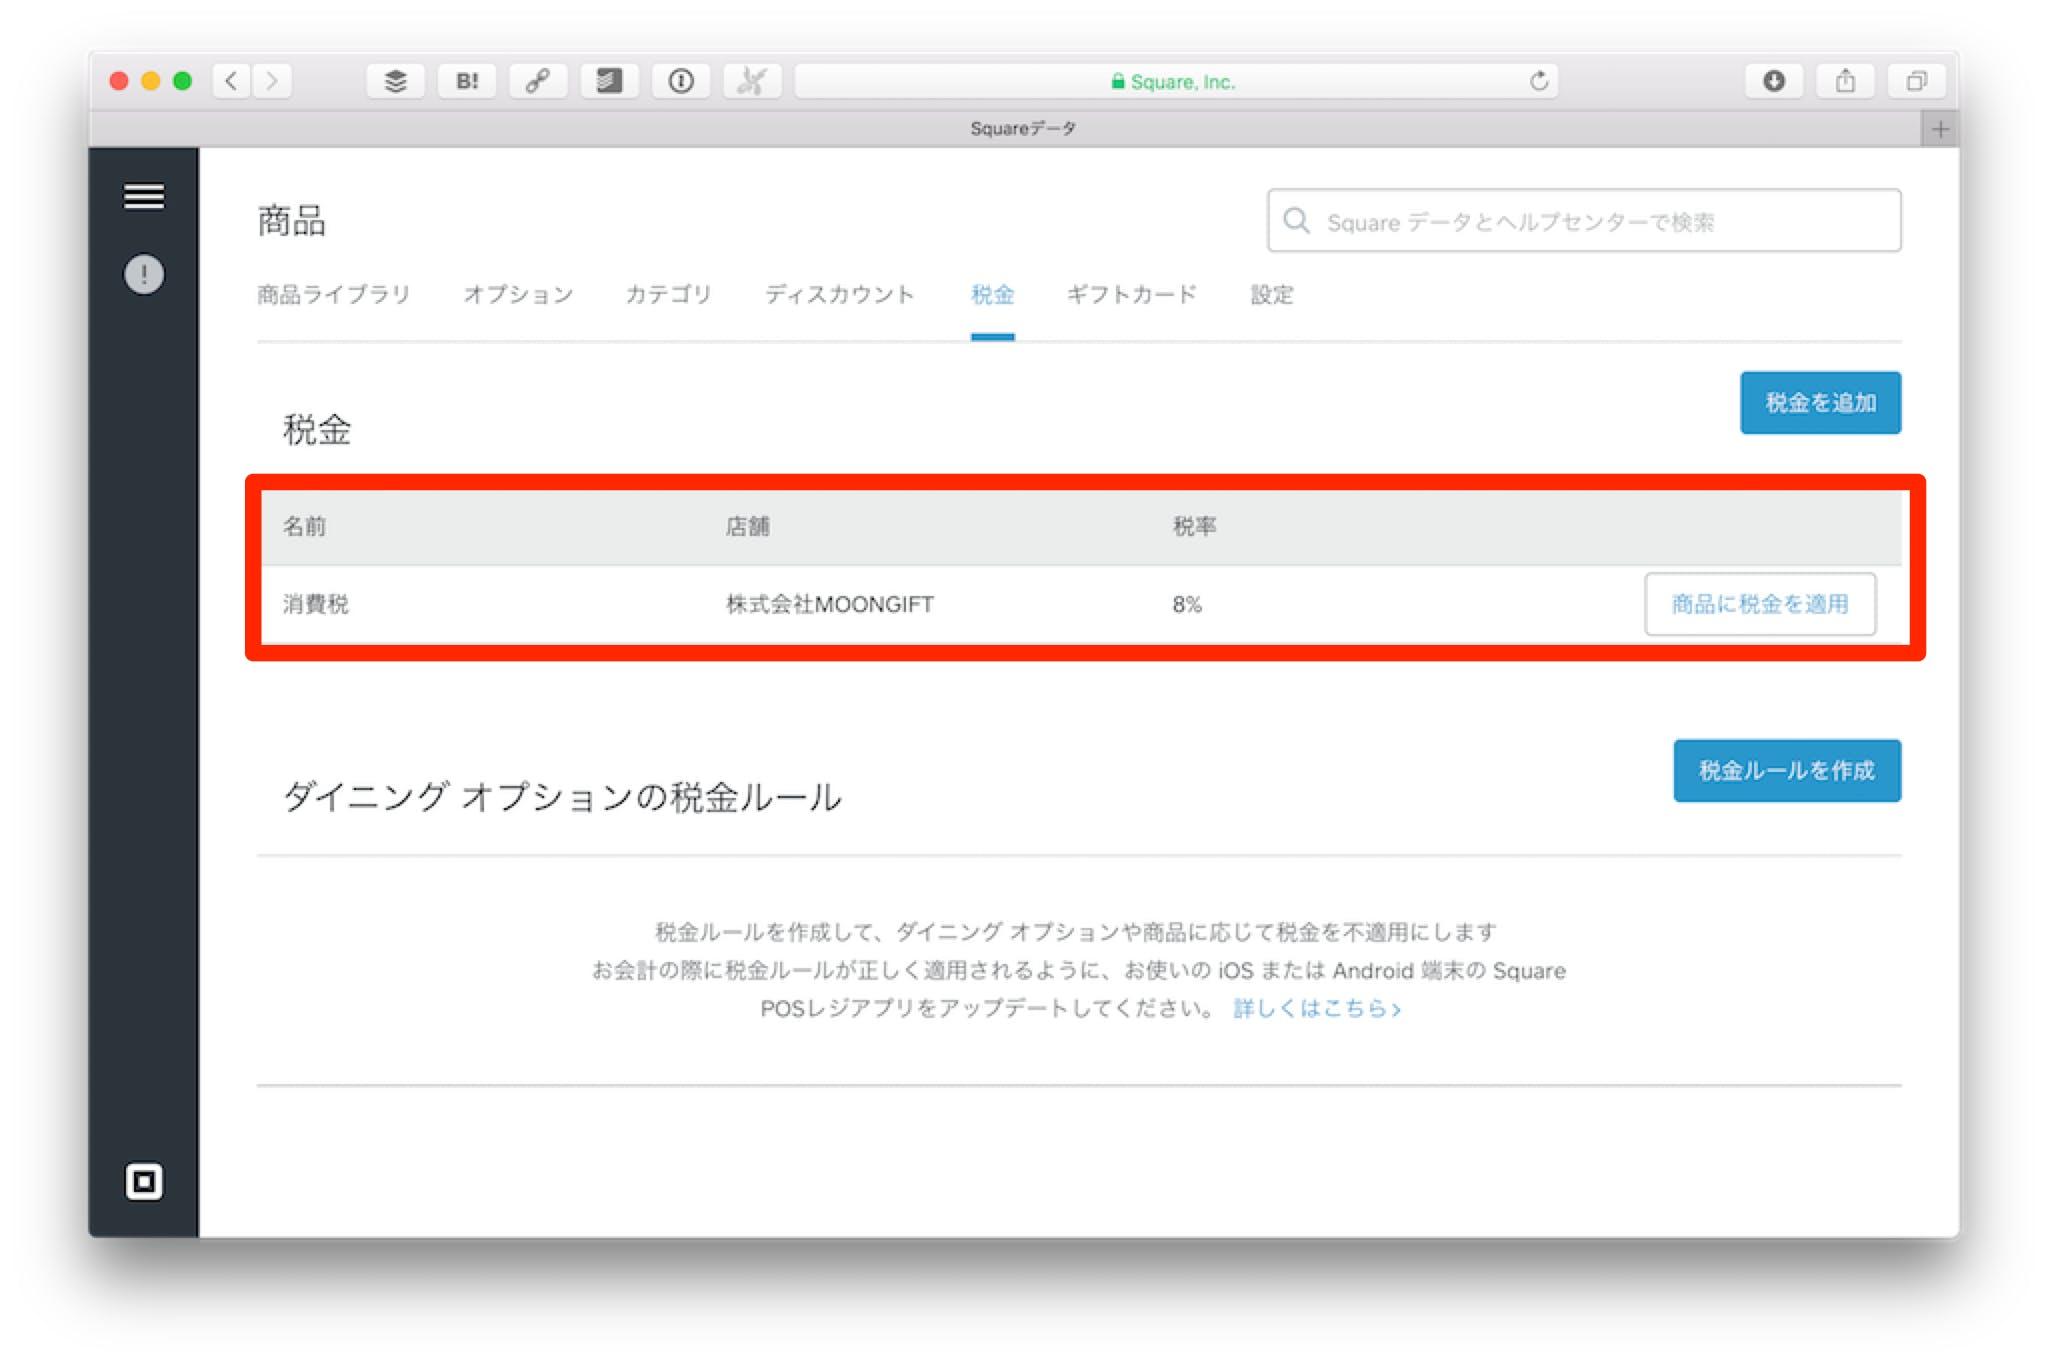 Screenshot_ 2017-11-25 11.30.28.png